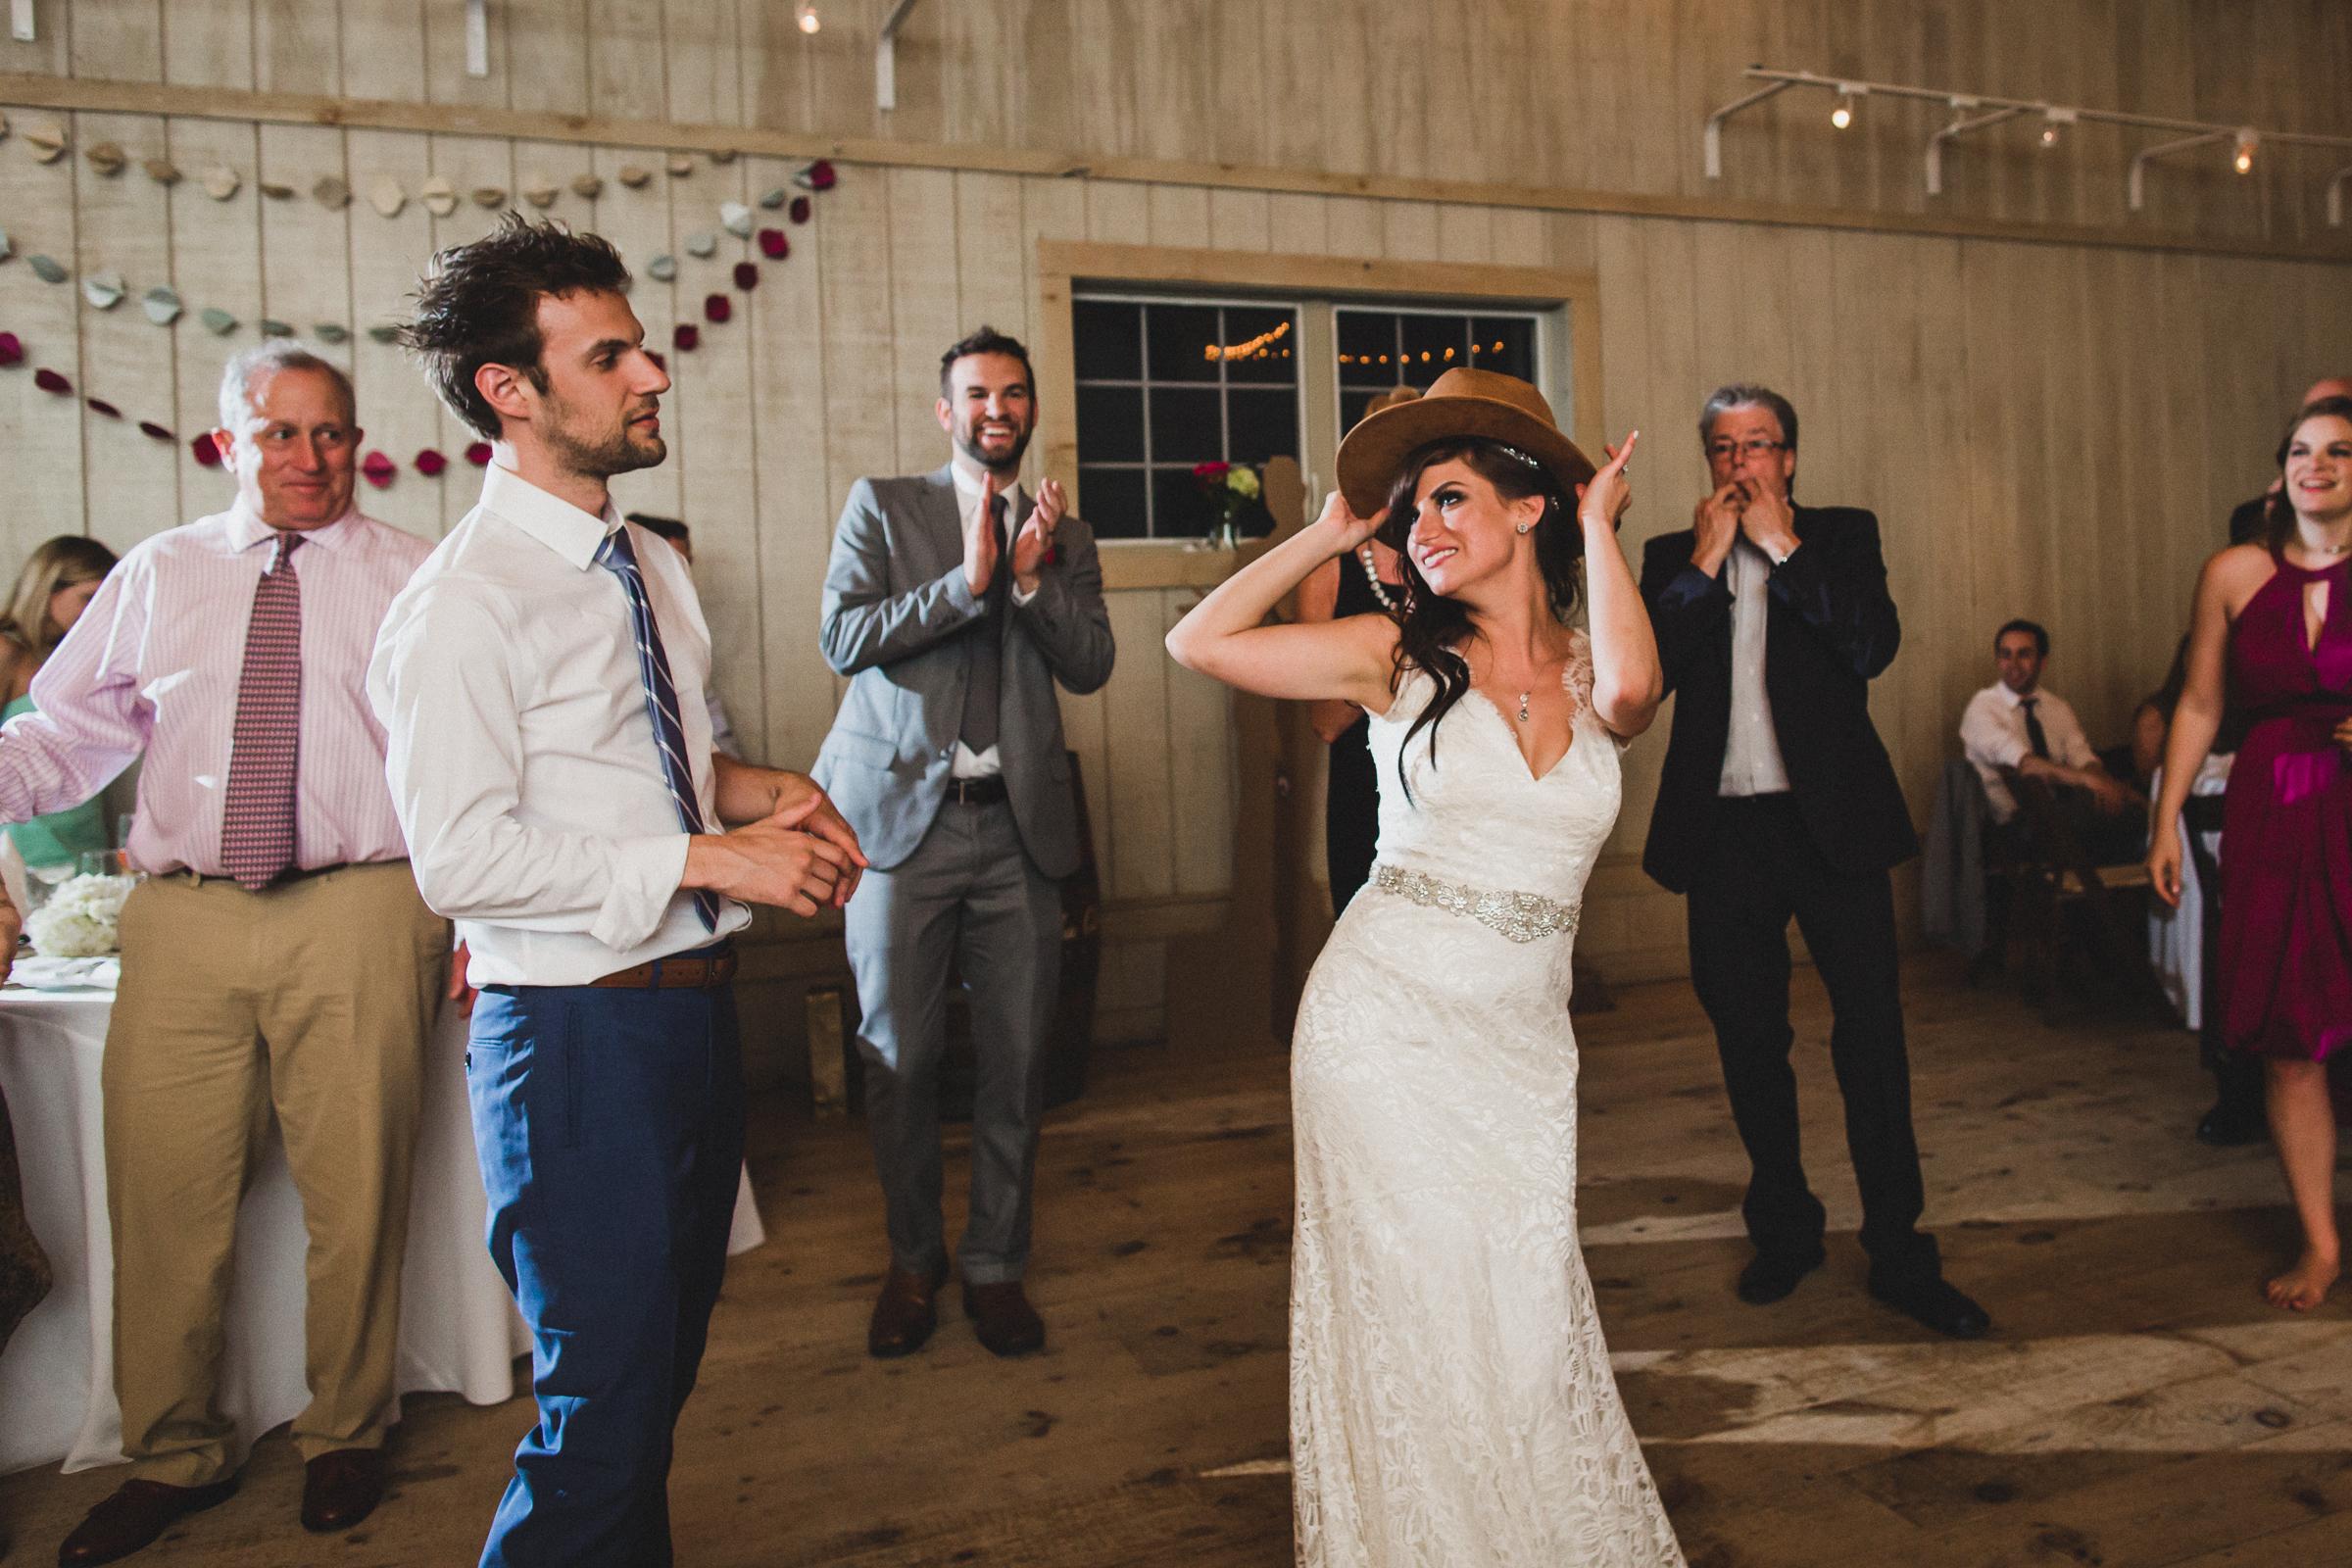 Martha-Clara-Vineyard-Long-Island-Documentary-Wedding-Photographer-92.jpg